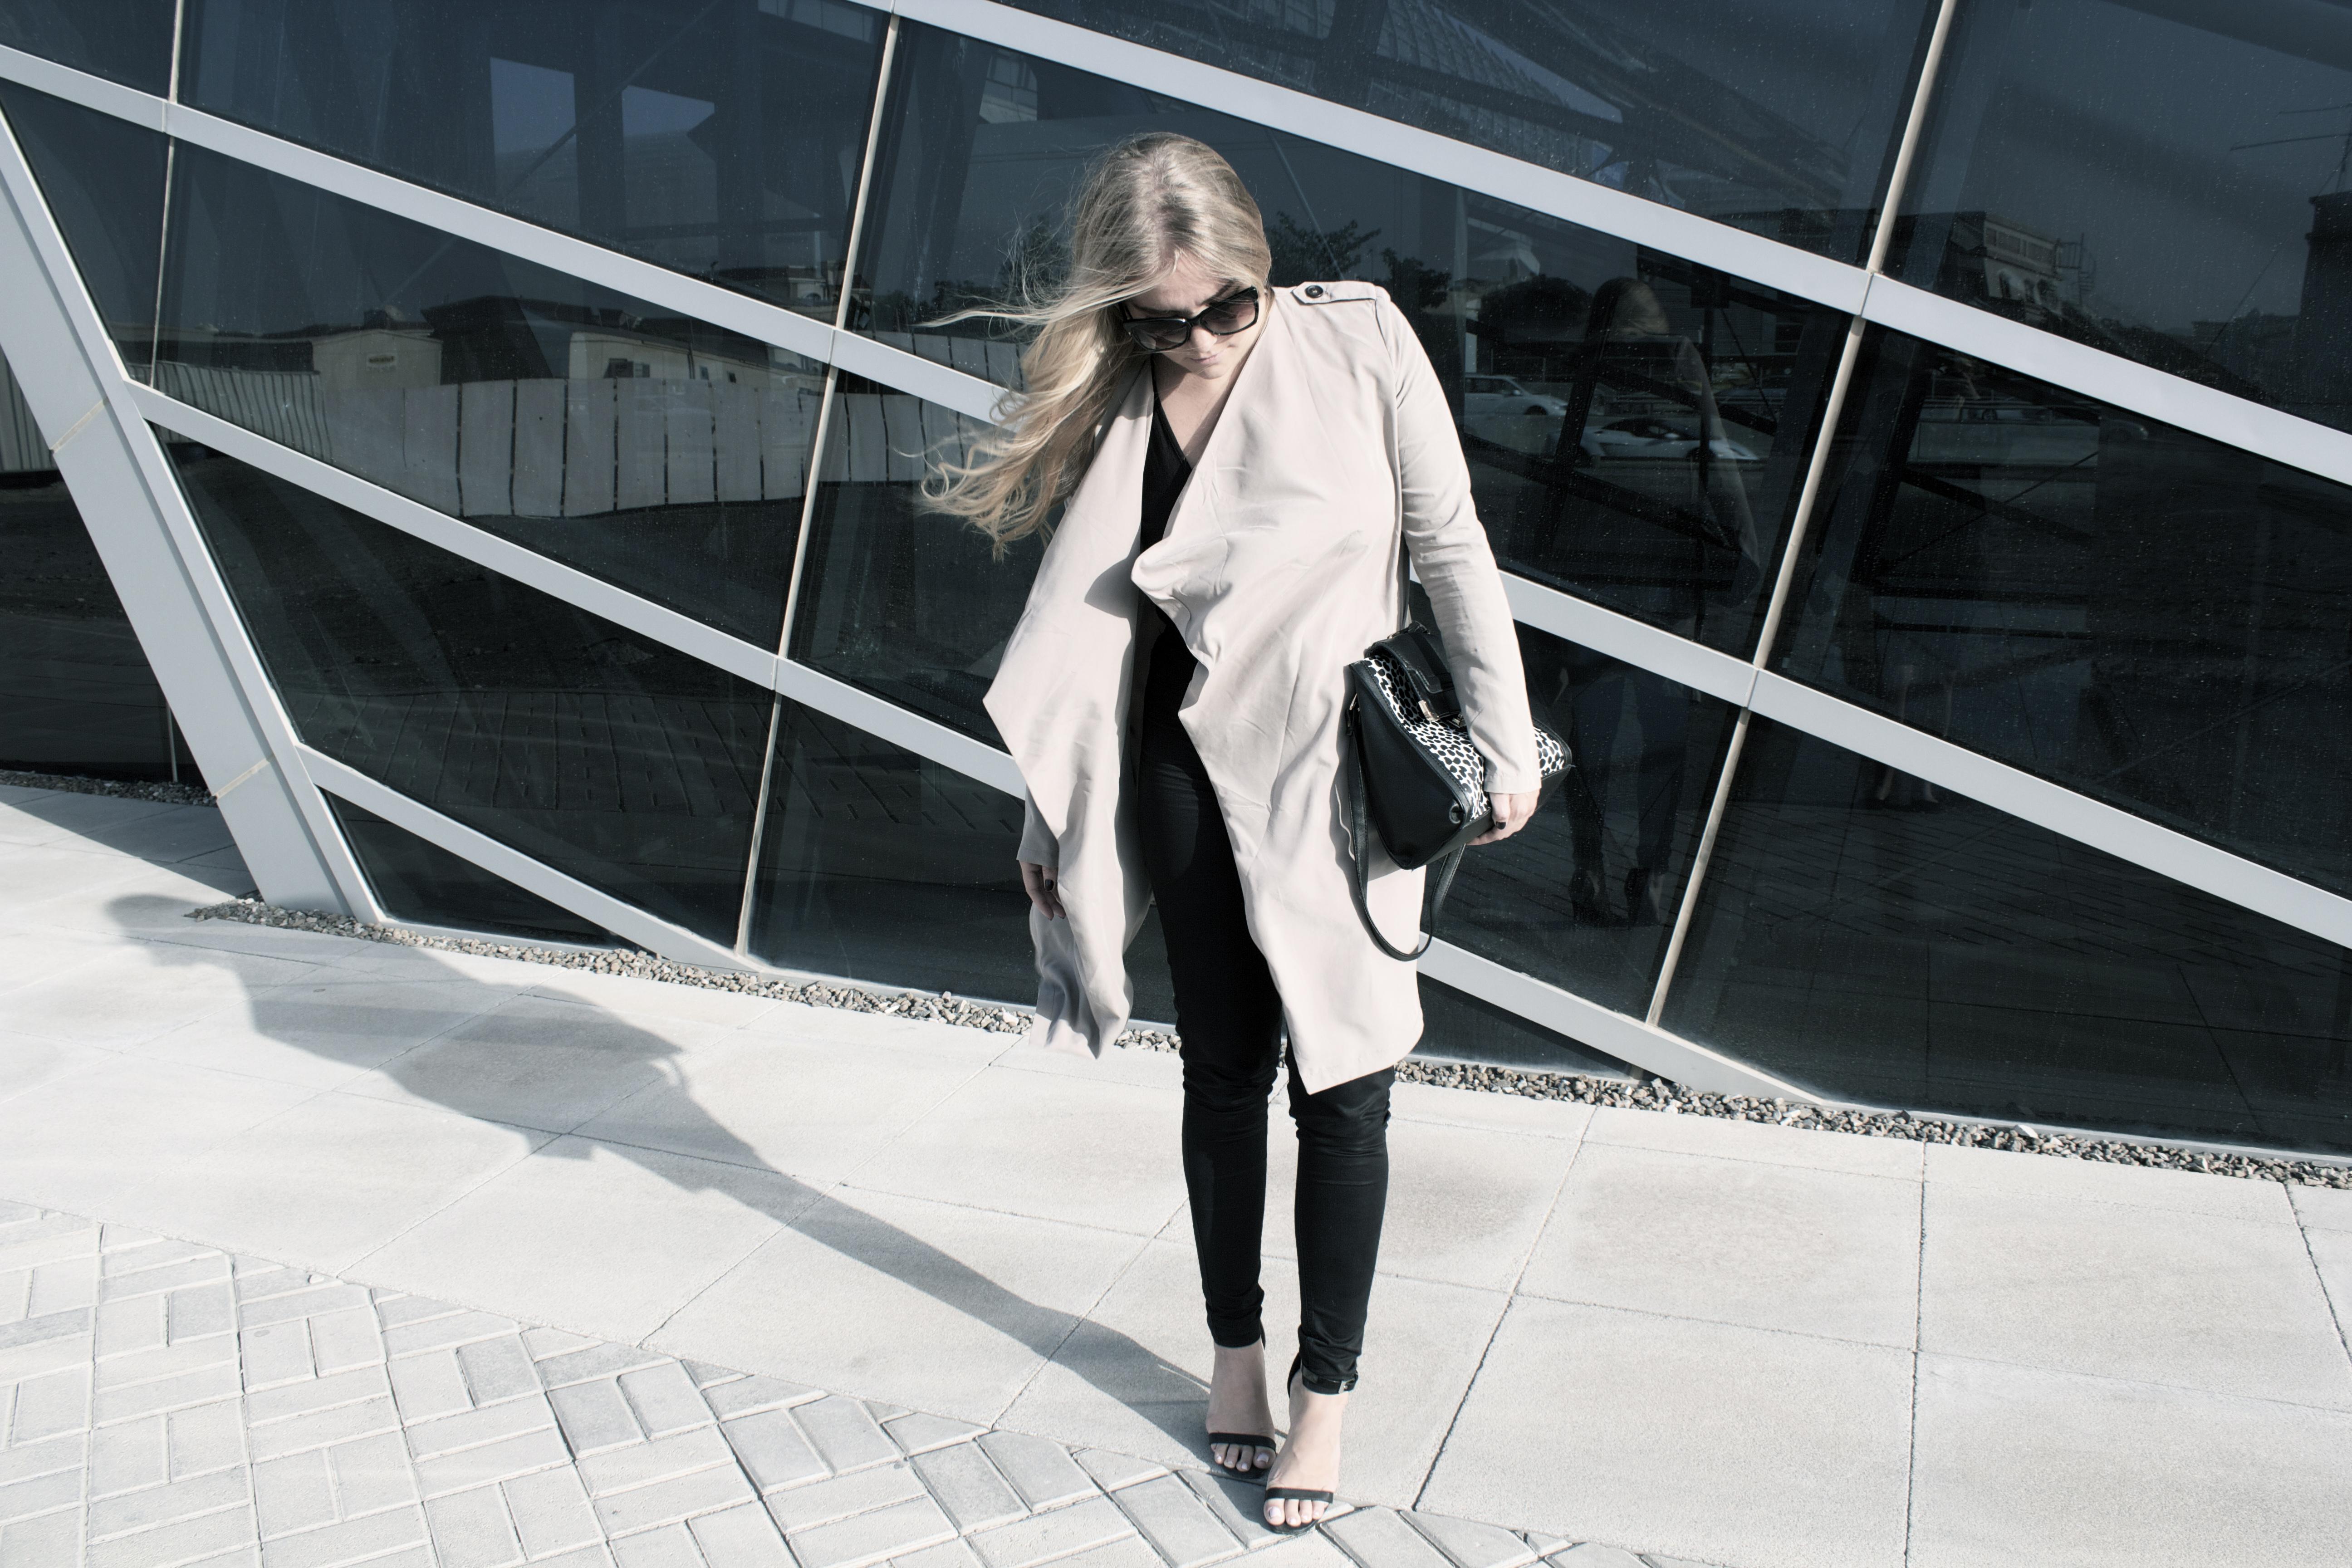 milli midwood dubai fashion blogger